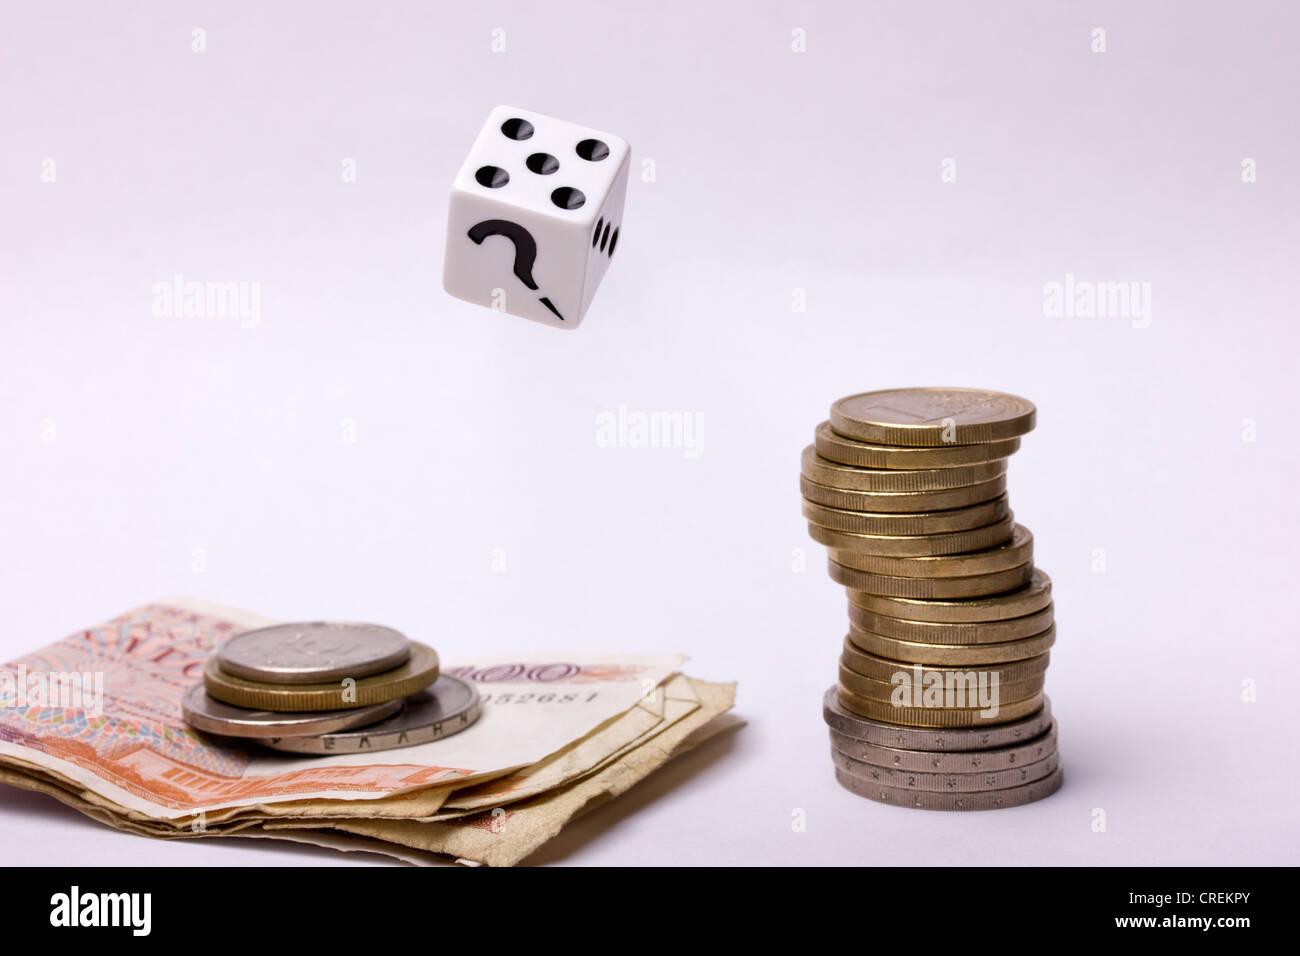 Euros and Drachmas - Stock Image